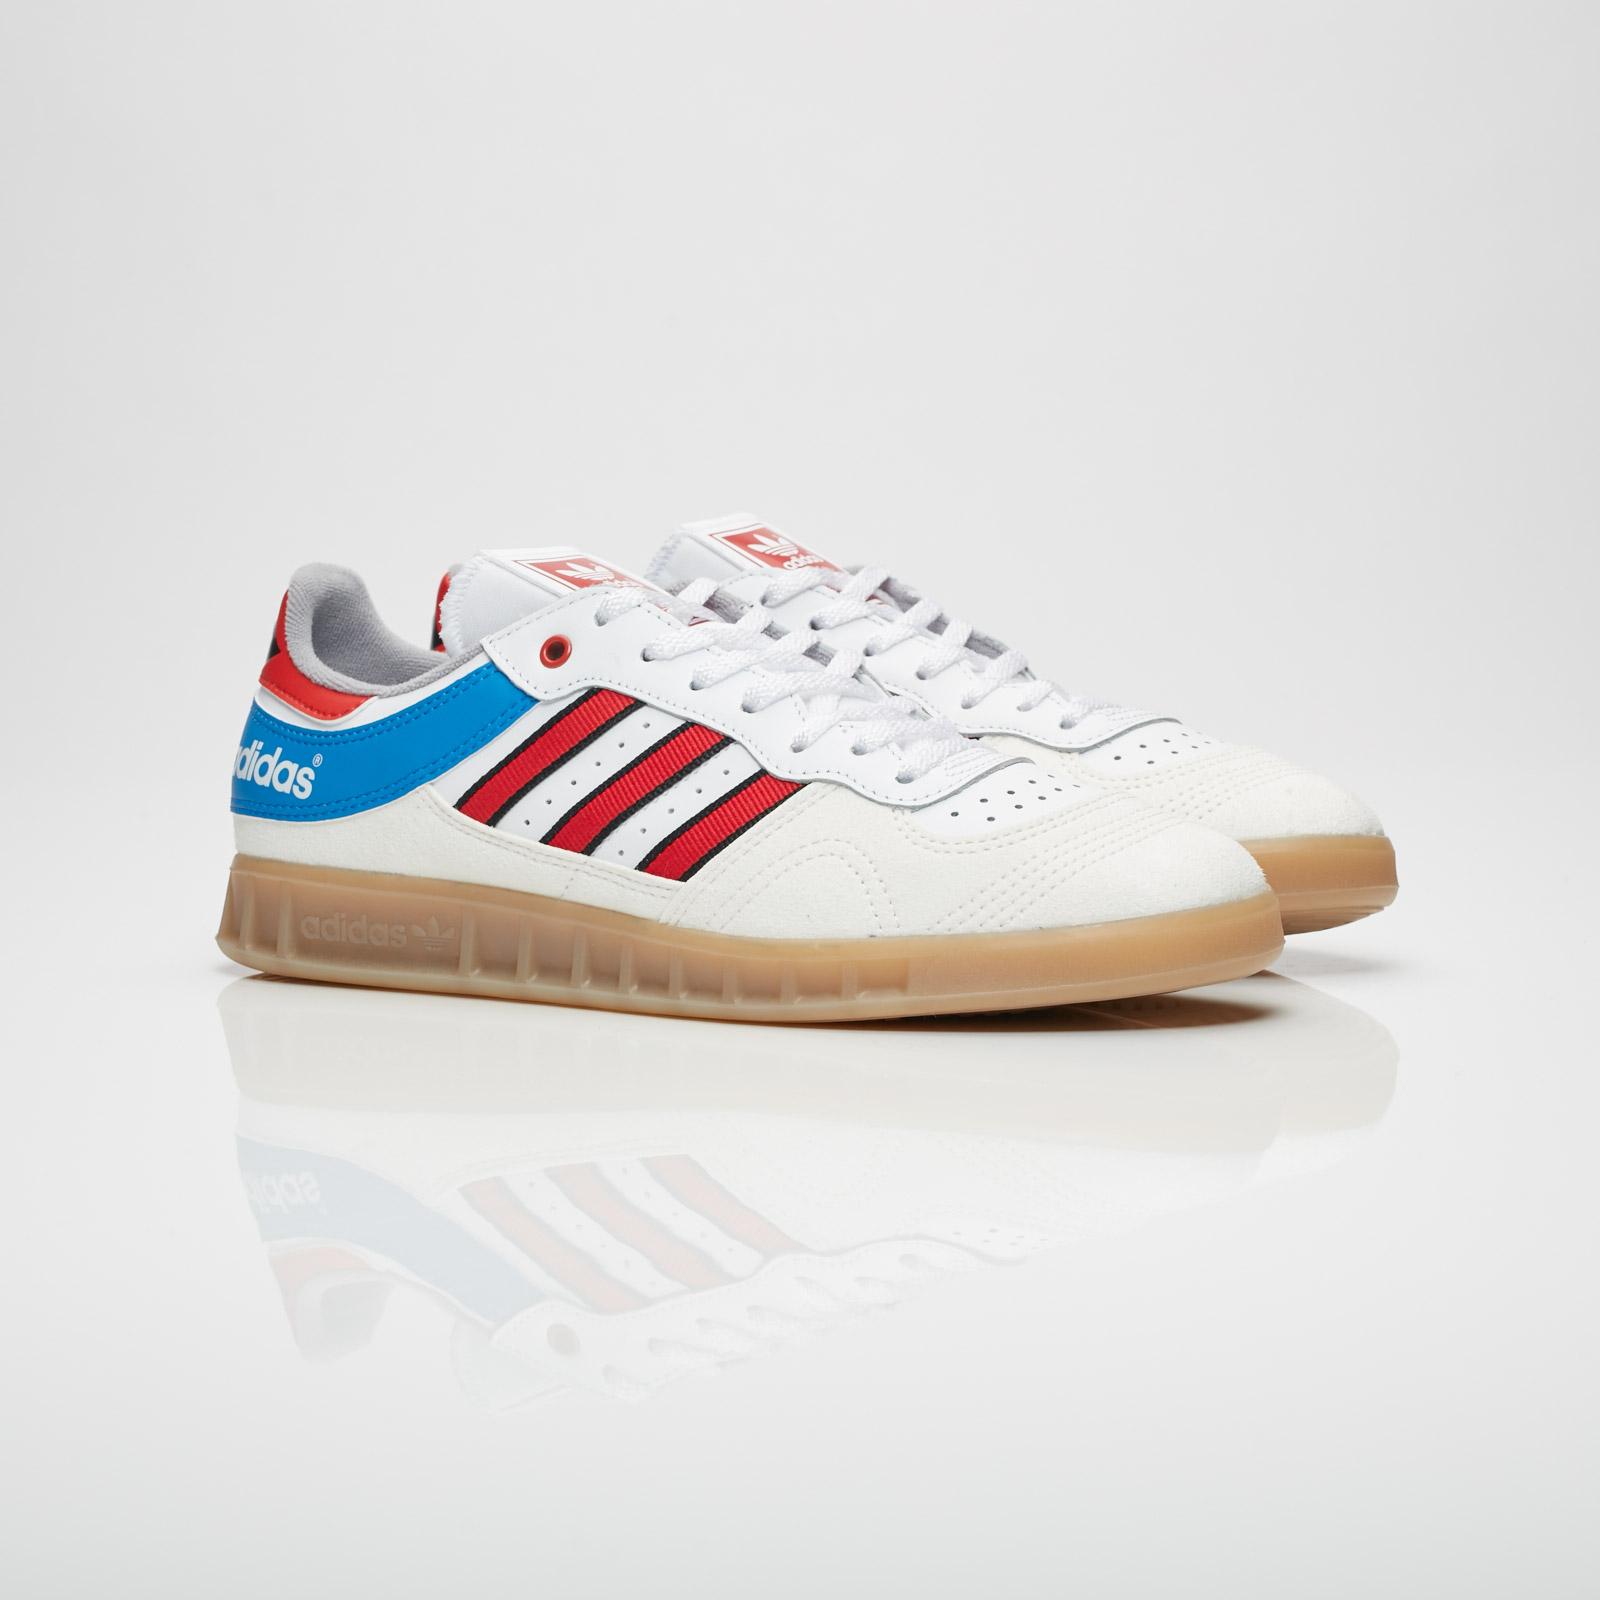 adidas Handball Top - By9535 - Sneakersnstuff I Sneakers ...